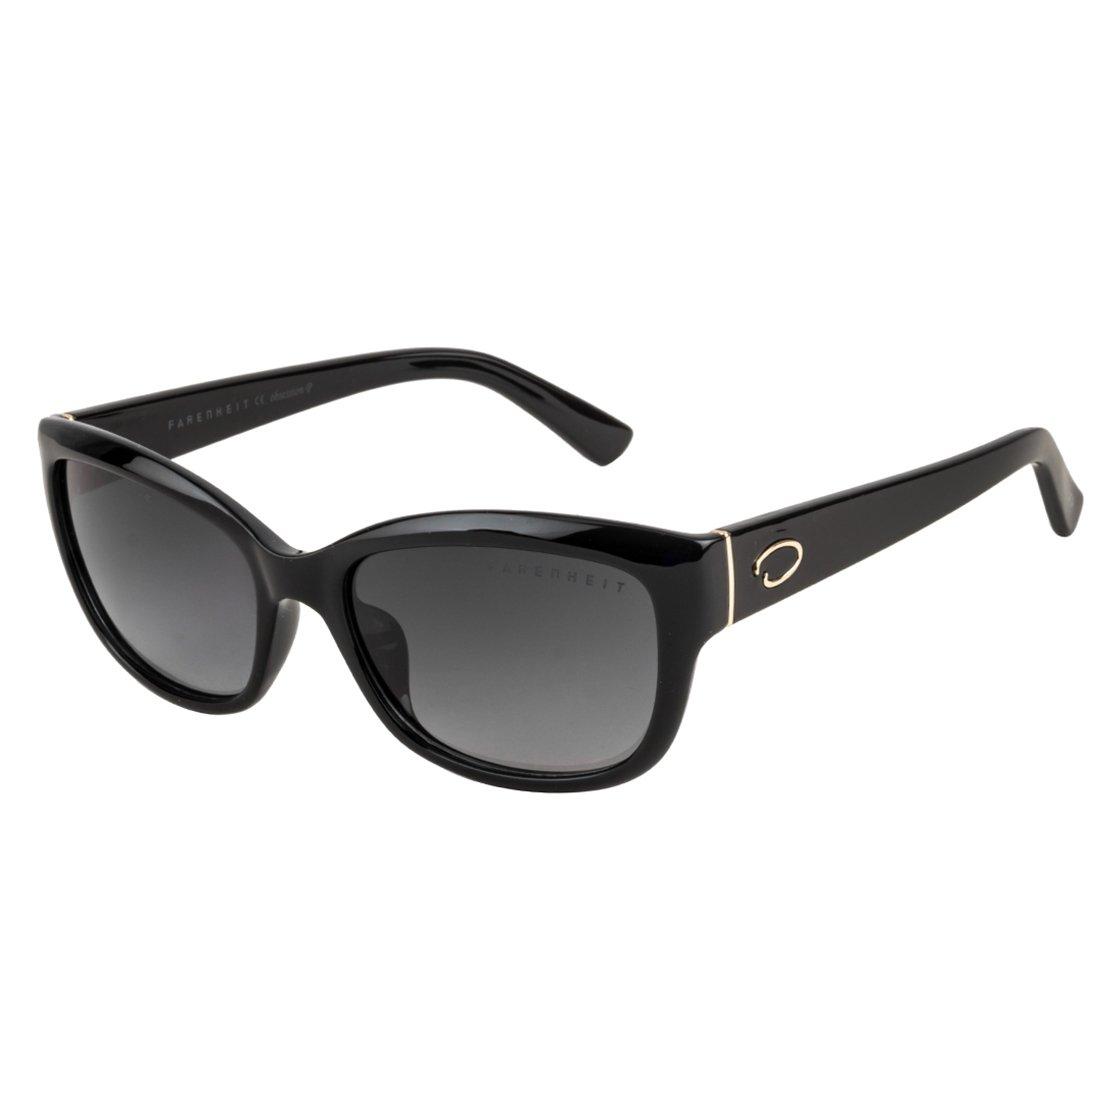 cfa1bd8267 Farenheit Polarized Rectangular Women s Sunglasses - (SOC-FA-1614P ...